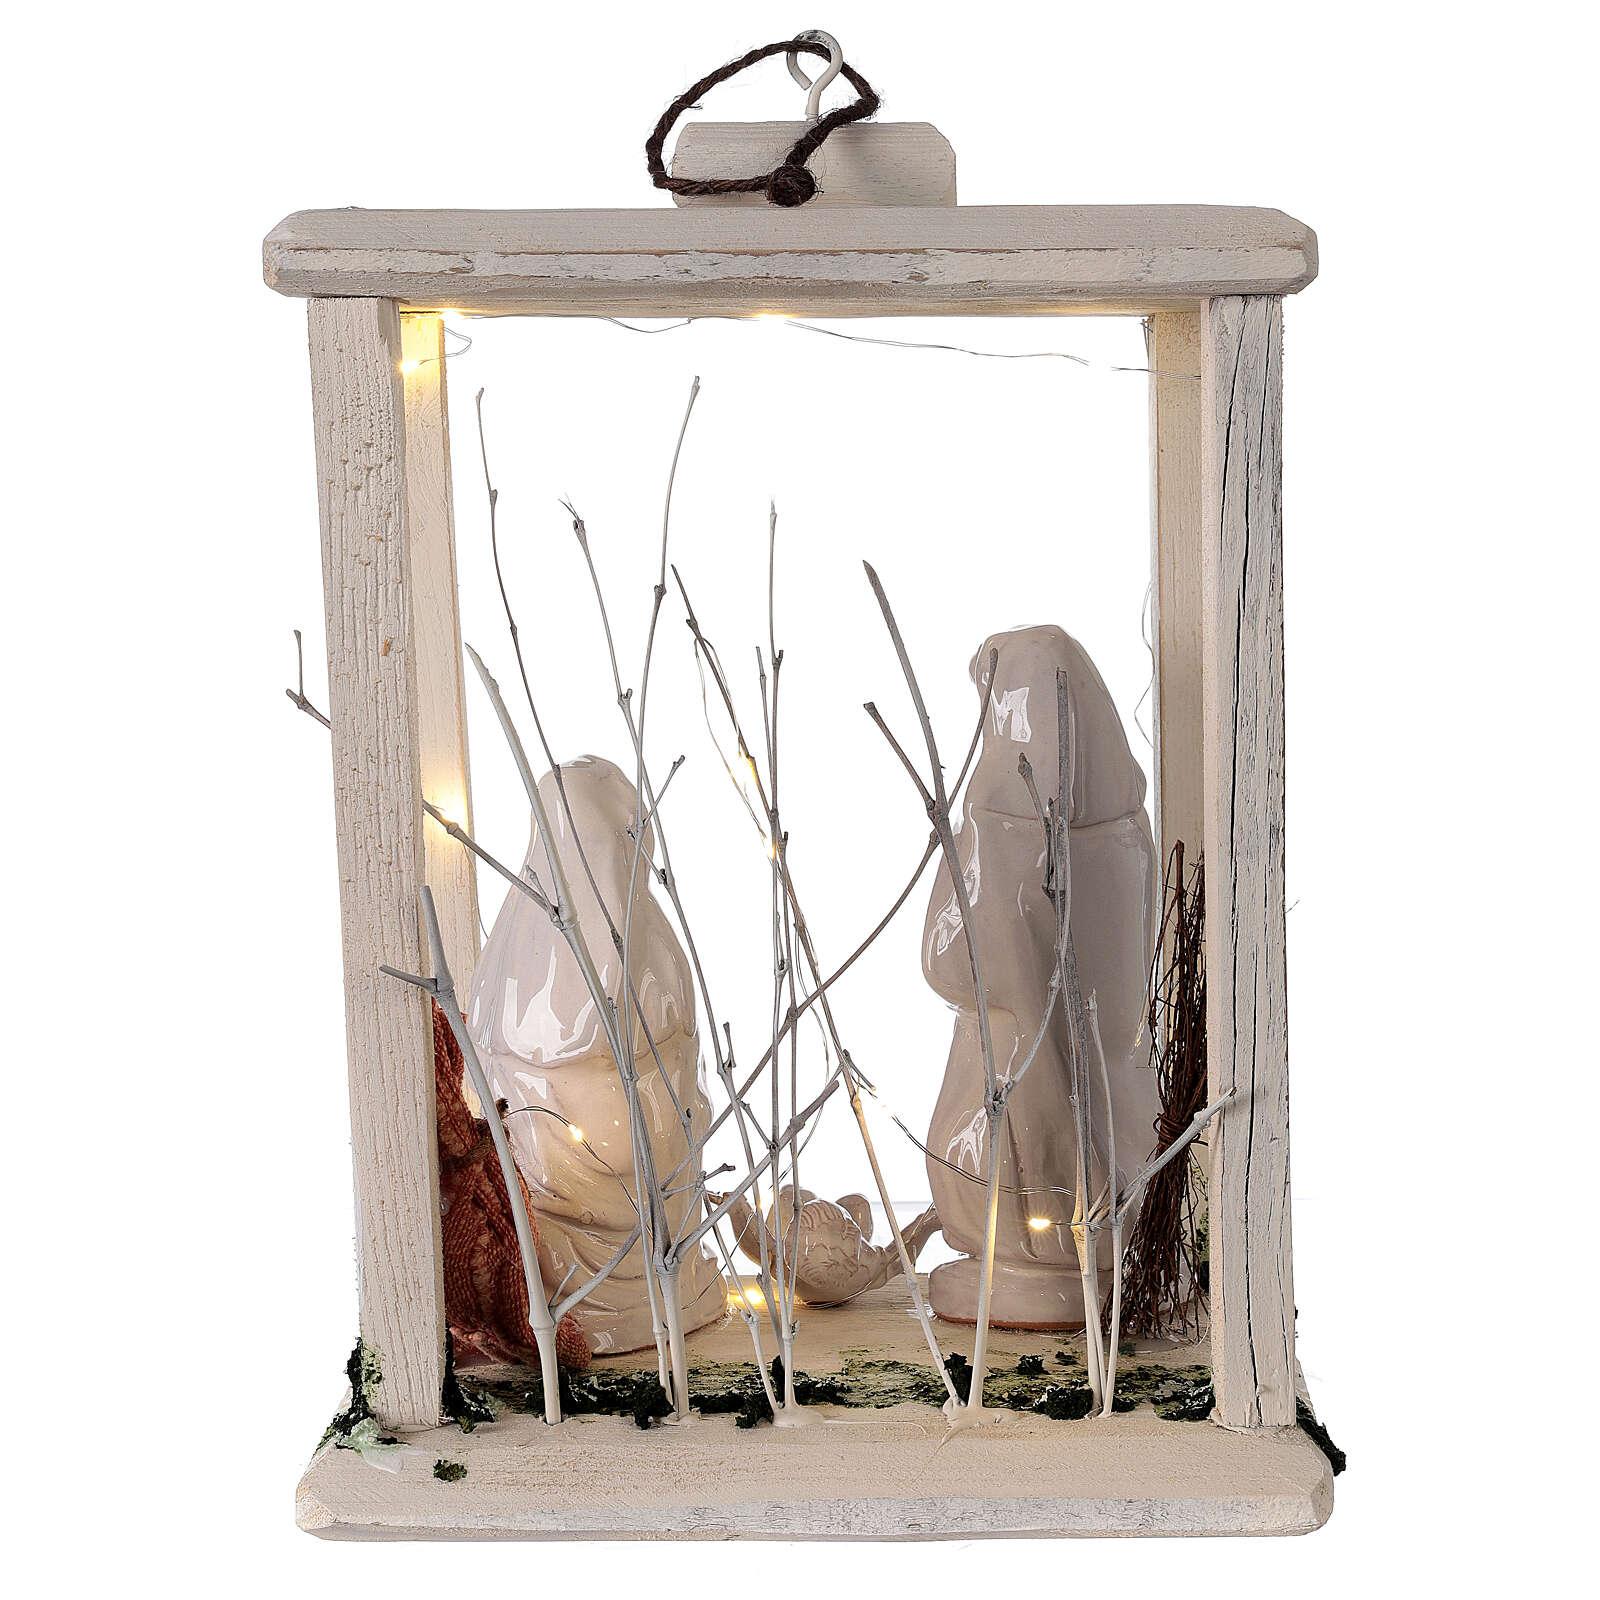 Linterna madera Natividad 20 cm terracota blanca Deruta 20 led 35x26x20 cm 4